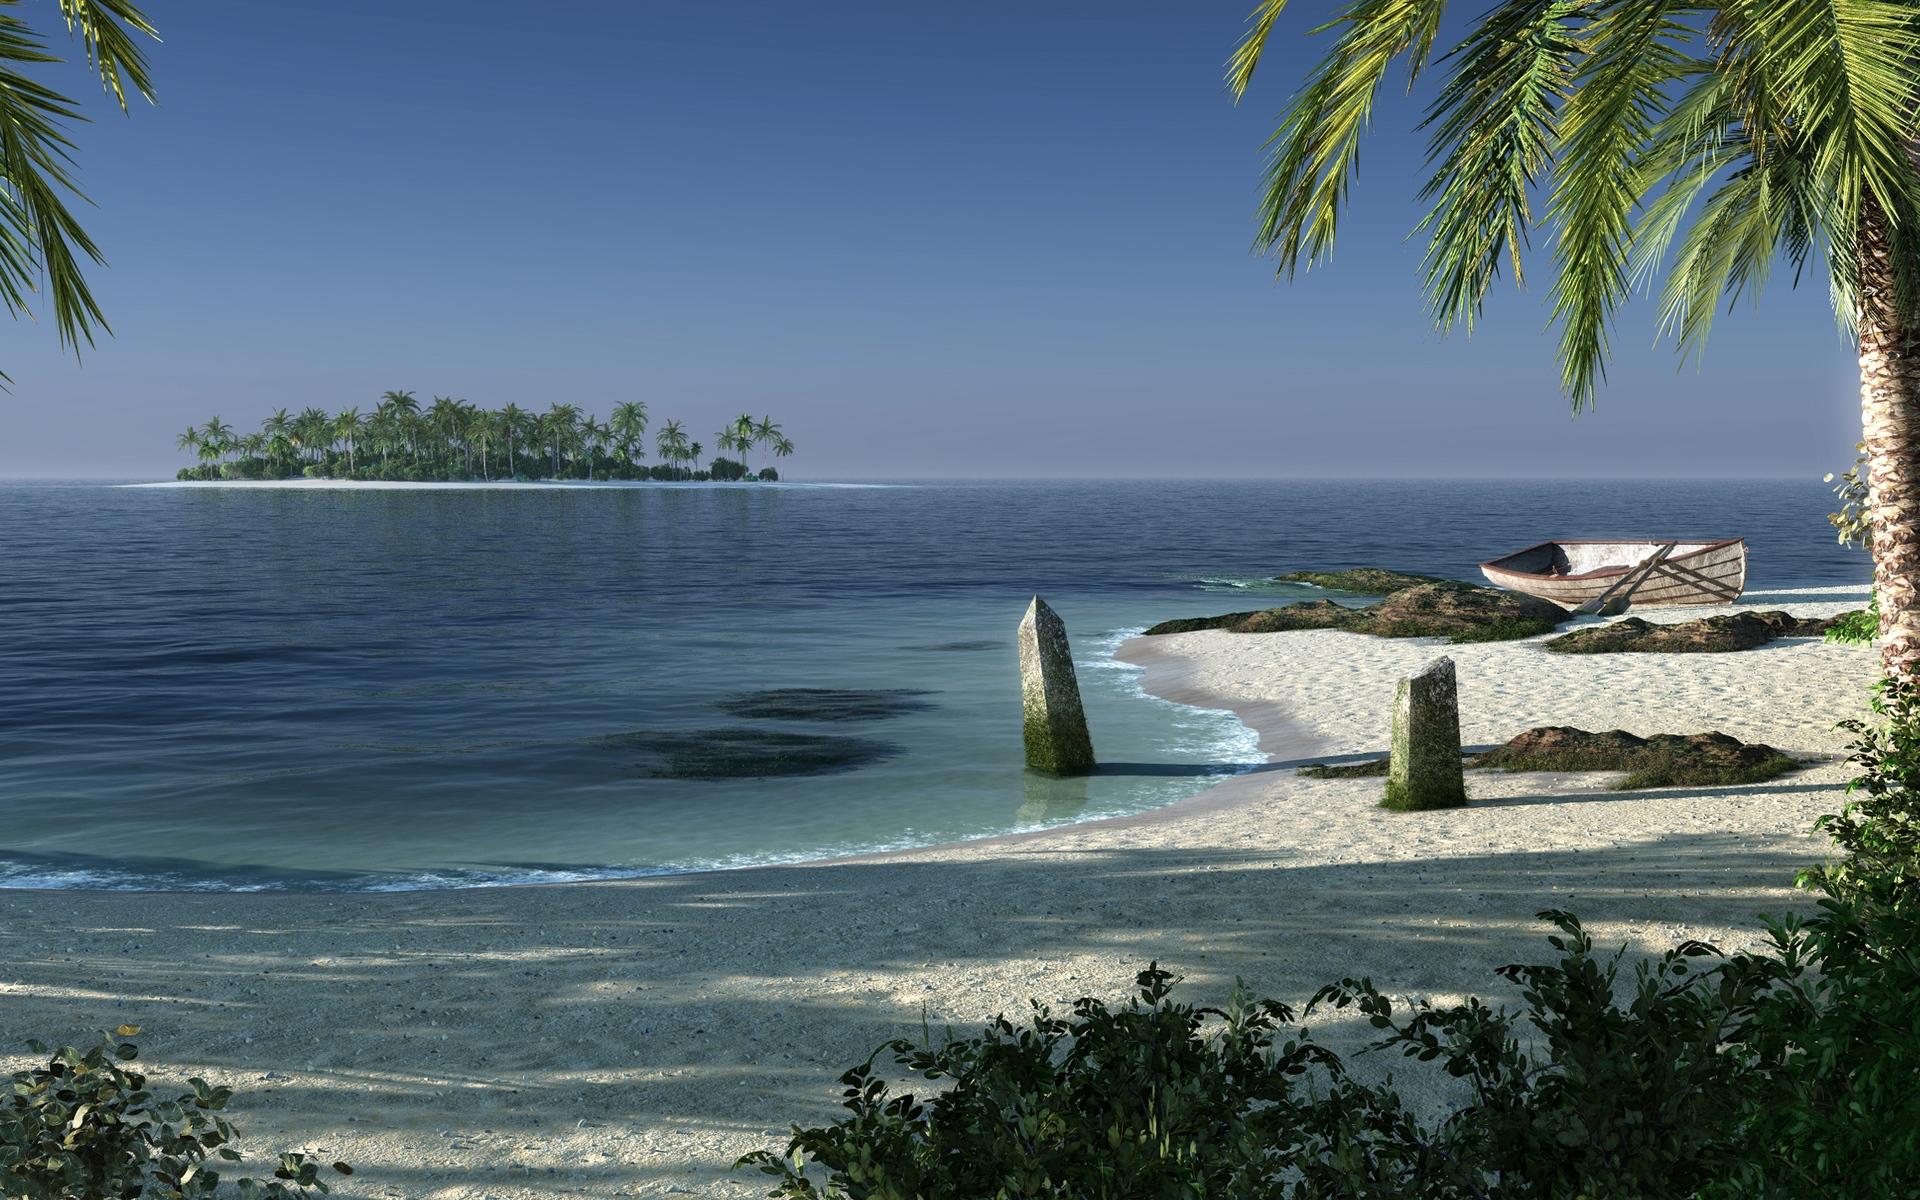 Beach fantasy island